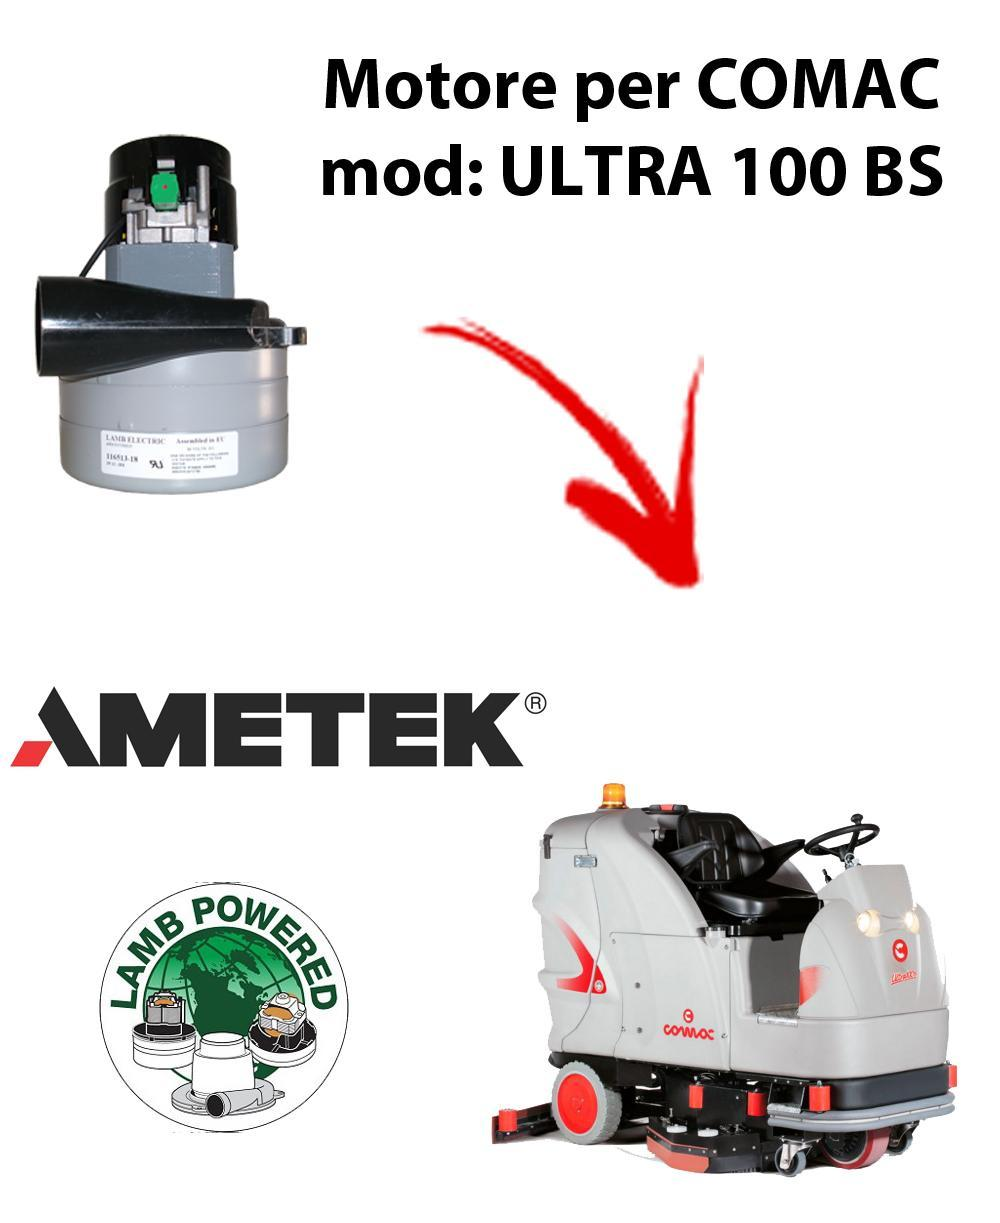 ULTRA 100 BS Saugmotor AMETEK für scheuersaugmaschinen COMAC